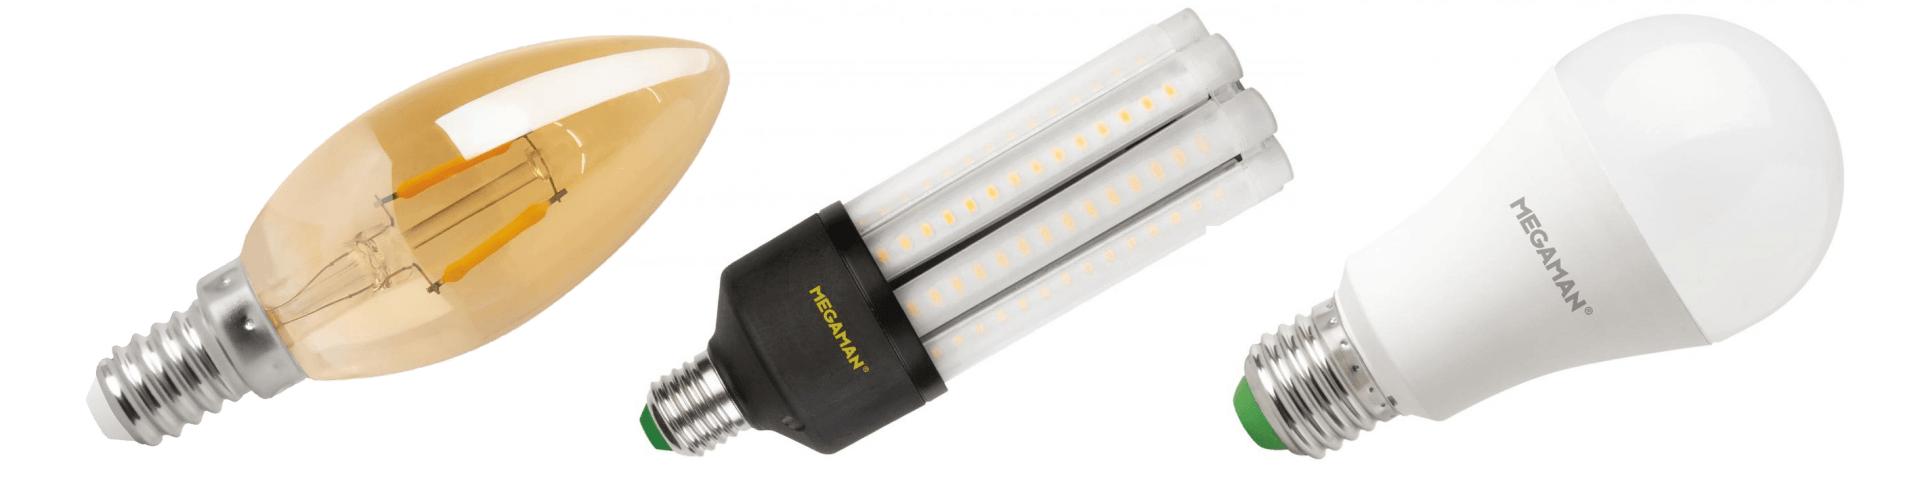 Energie zuinige verlichting led lampen megaman